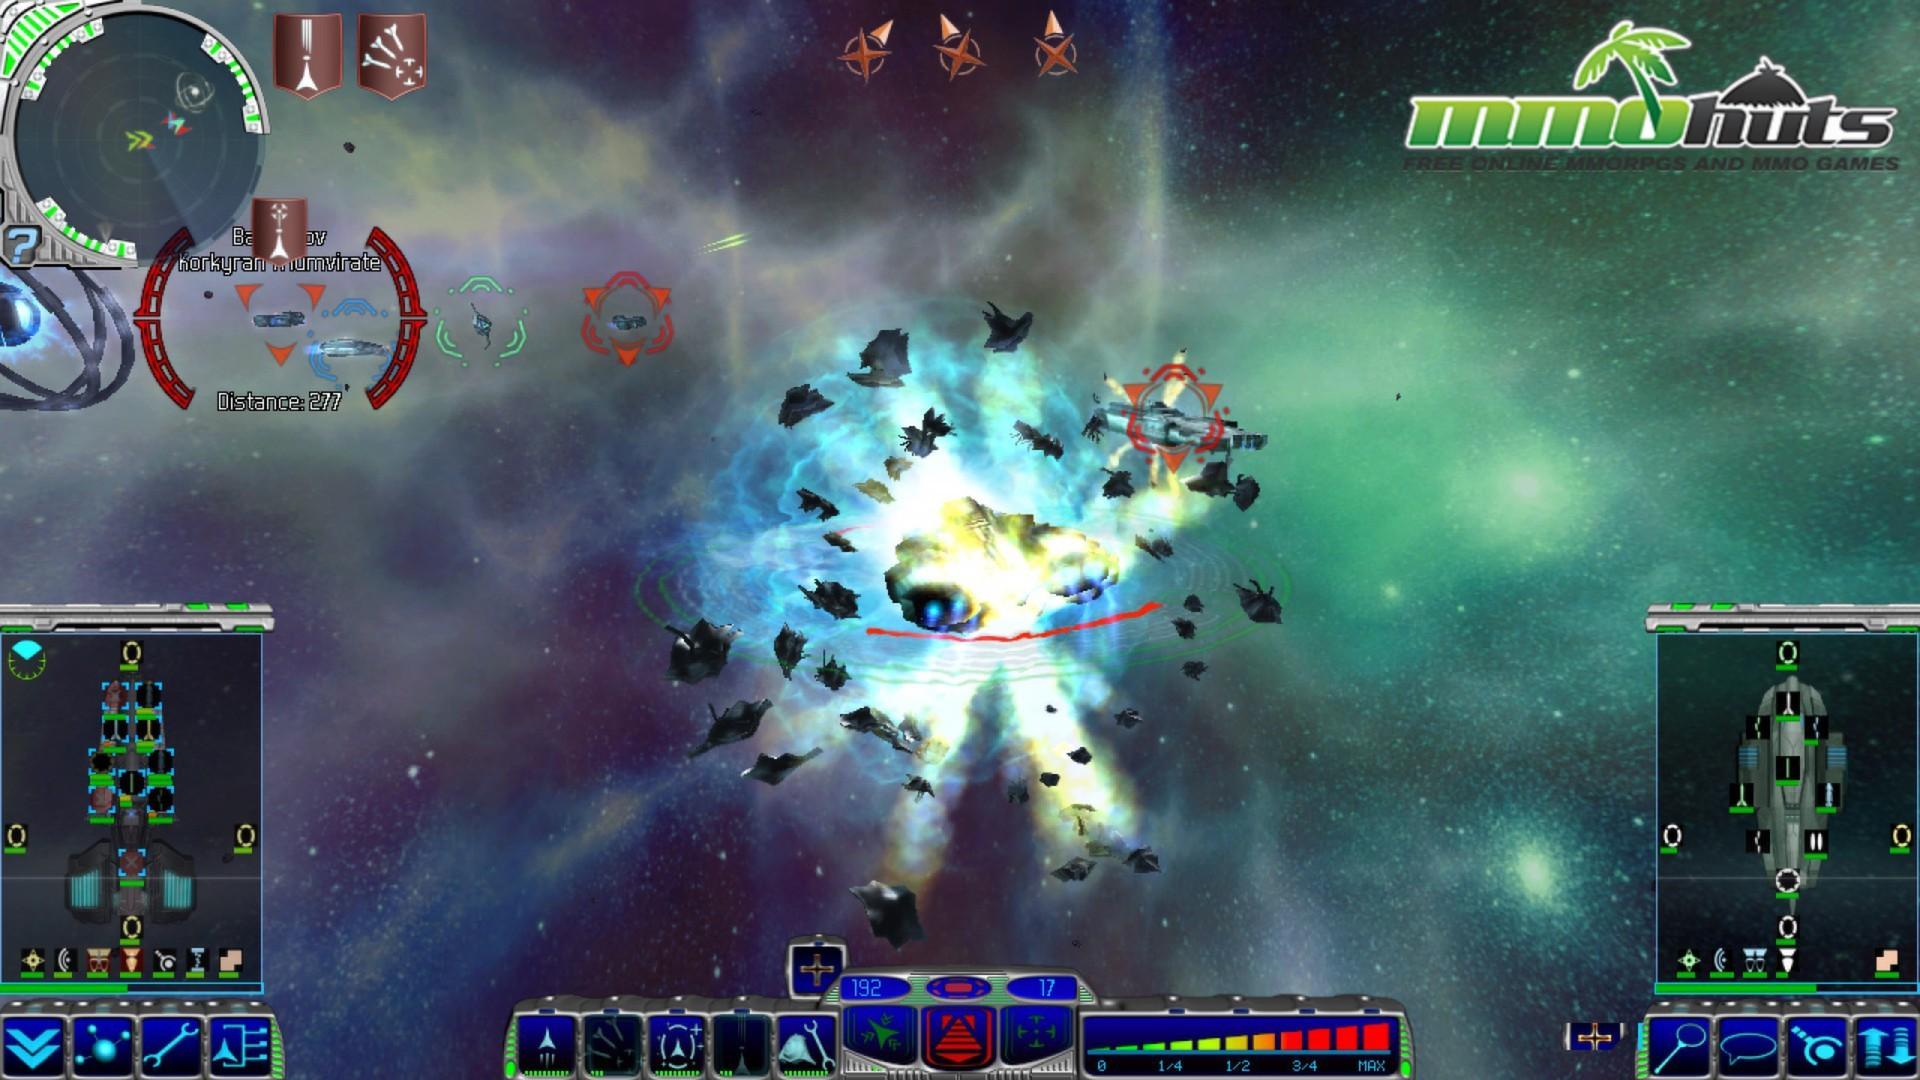 Starpoint Gemini_Explosion